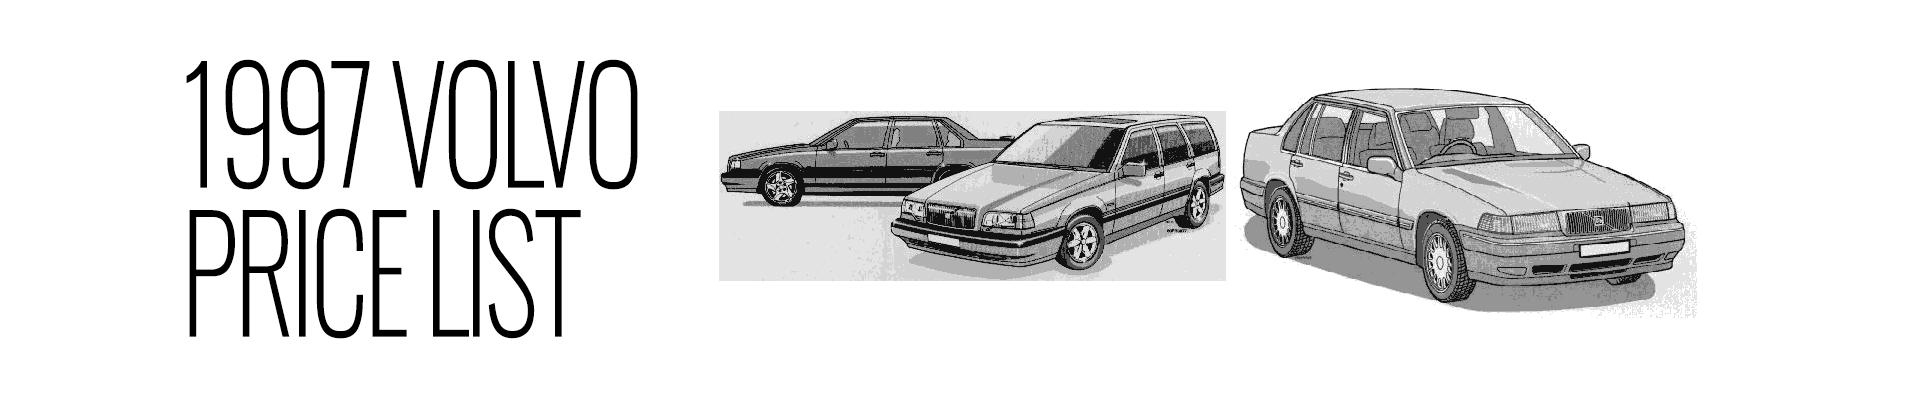 1997 Volvo Price List -